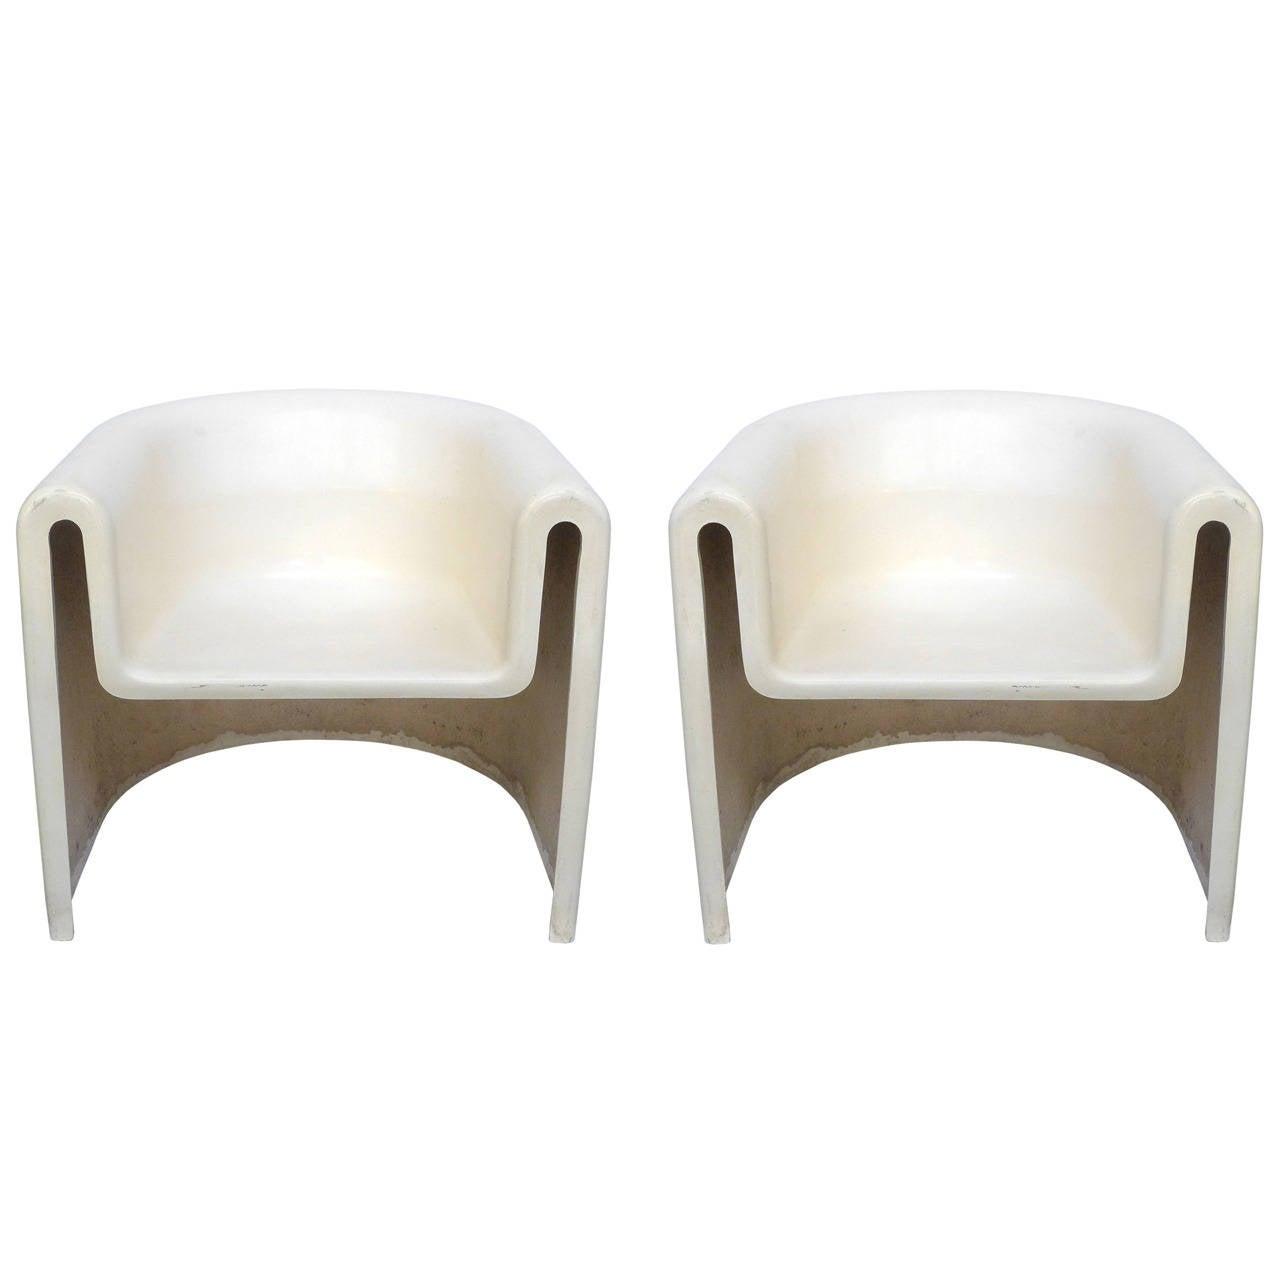 Pair of Vintage Cast Fiberglass Chairs